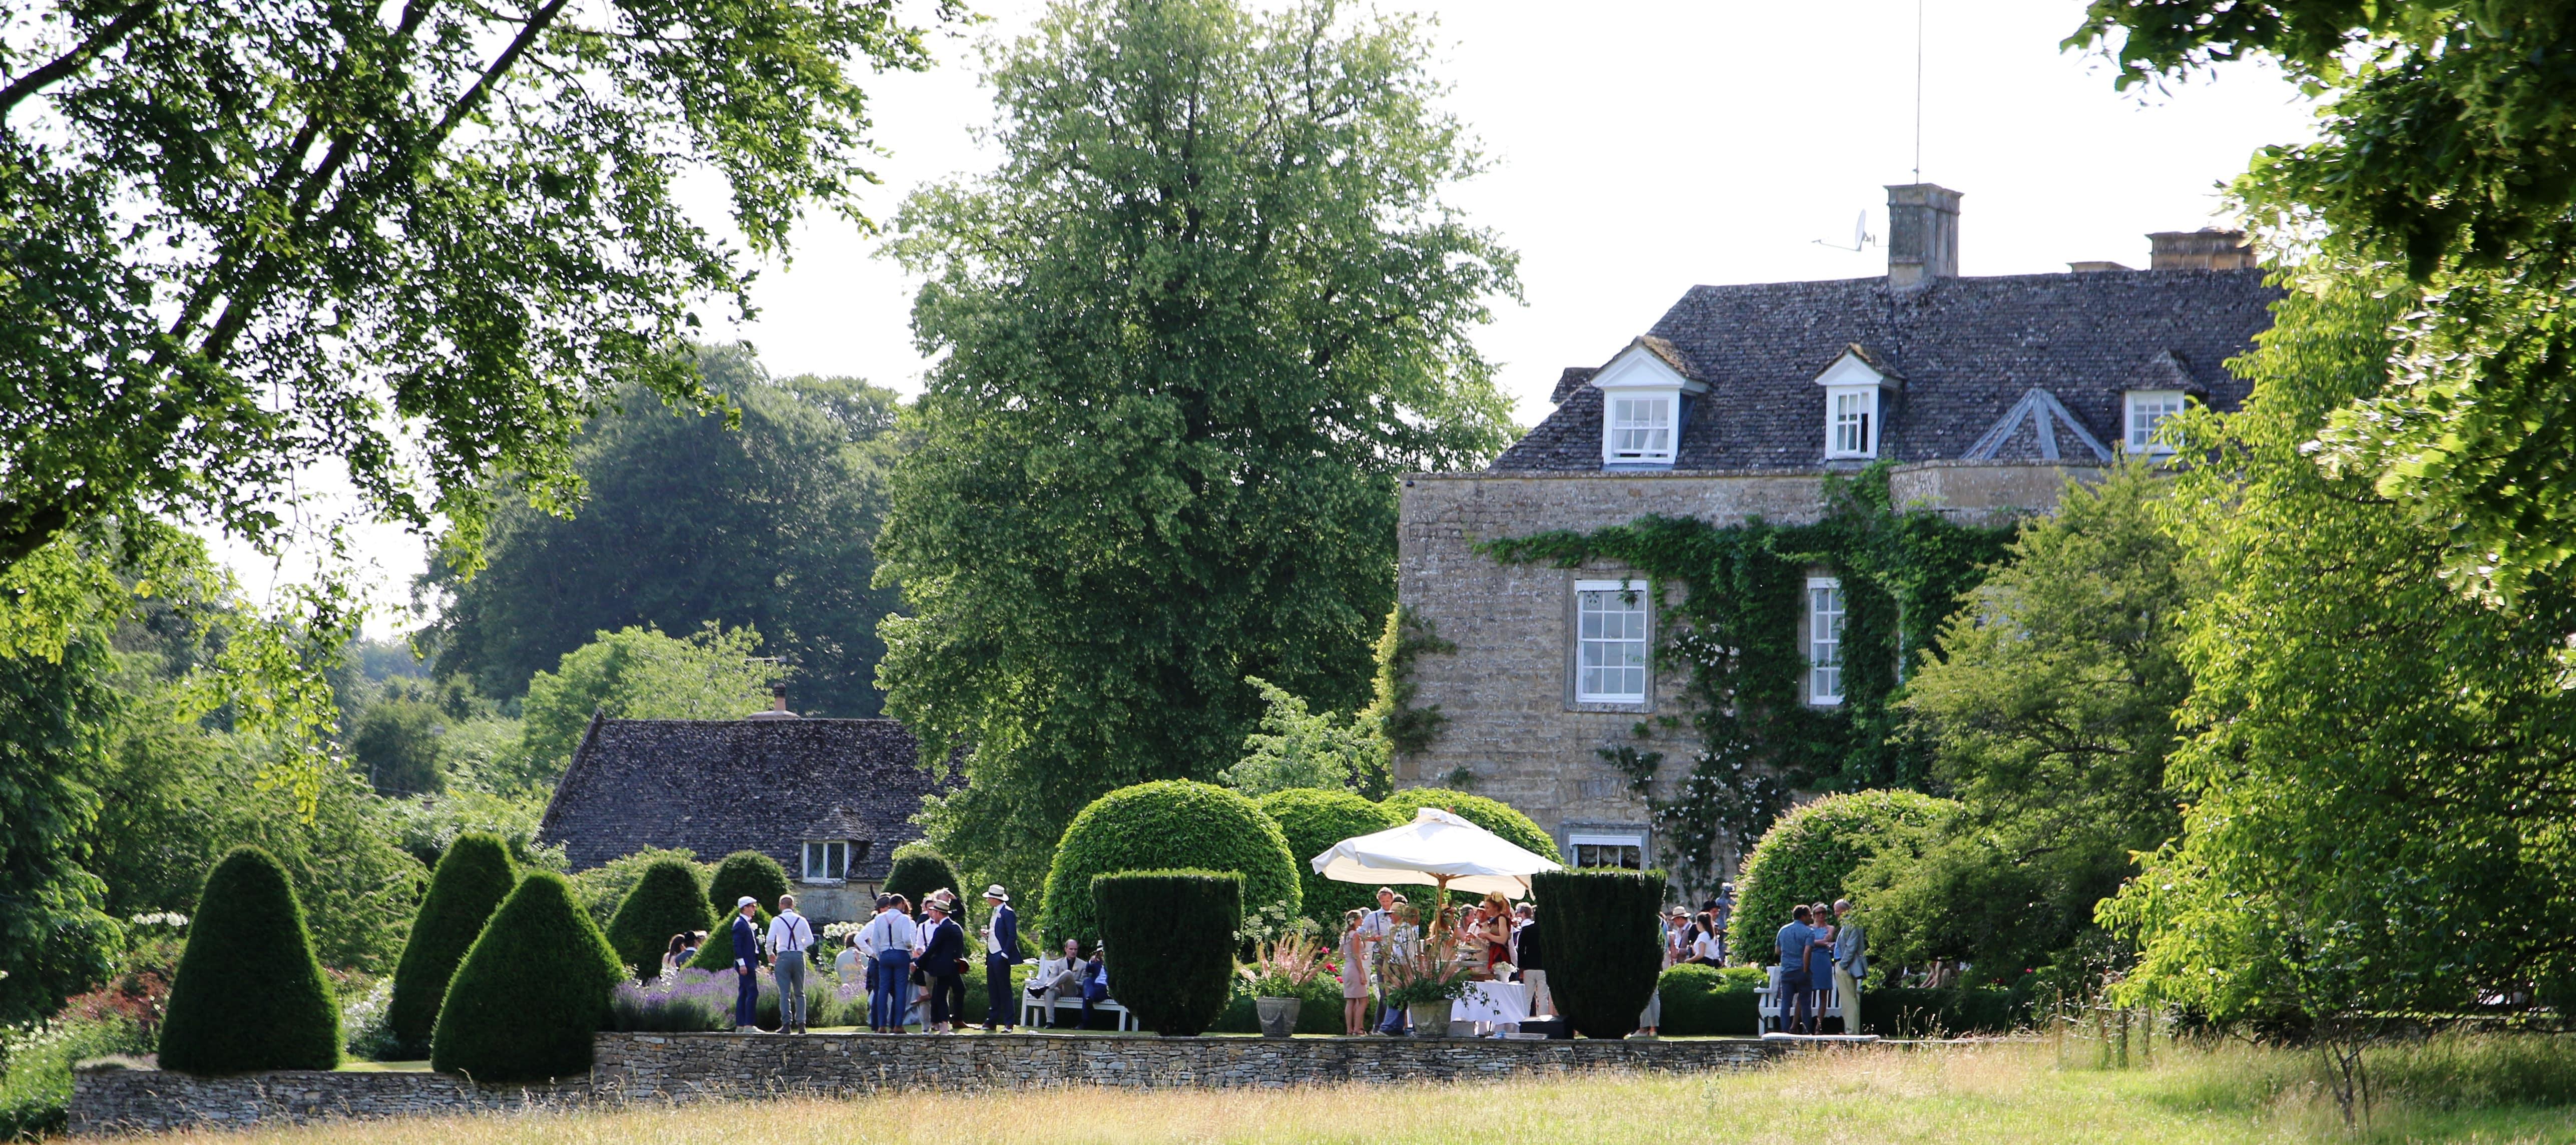 Cornwell-Manor-Garden-Party